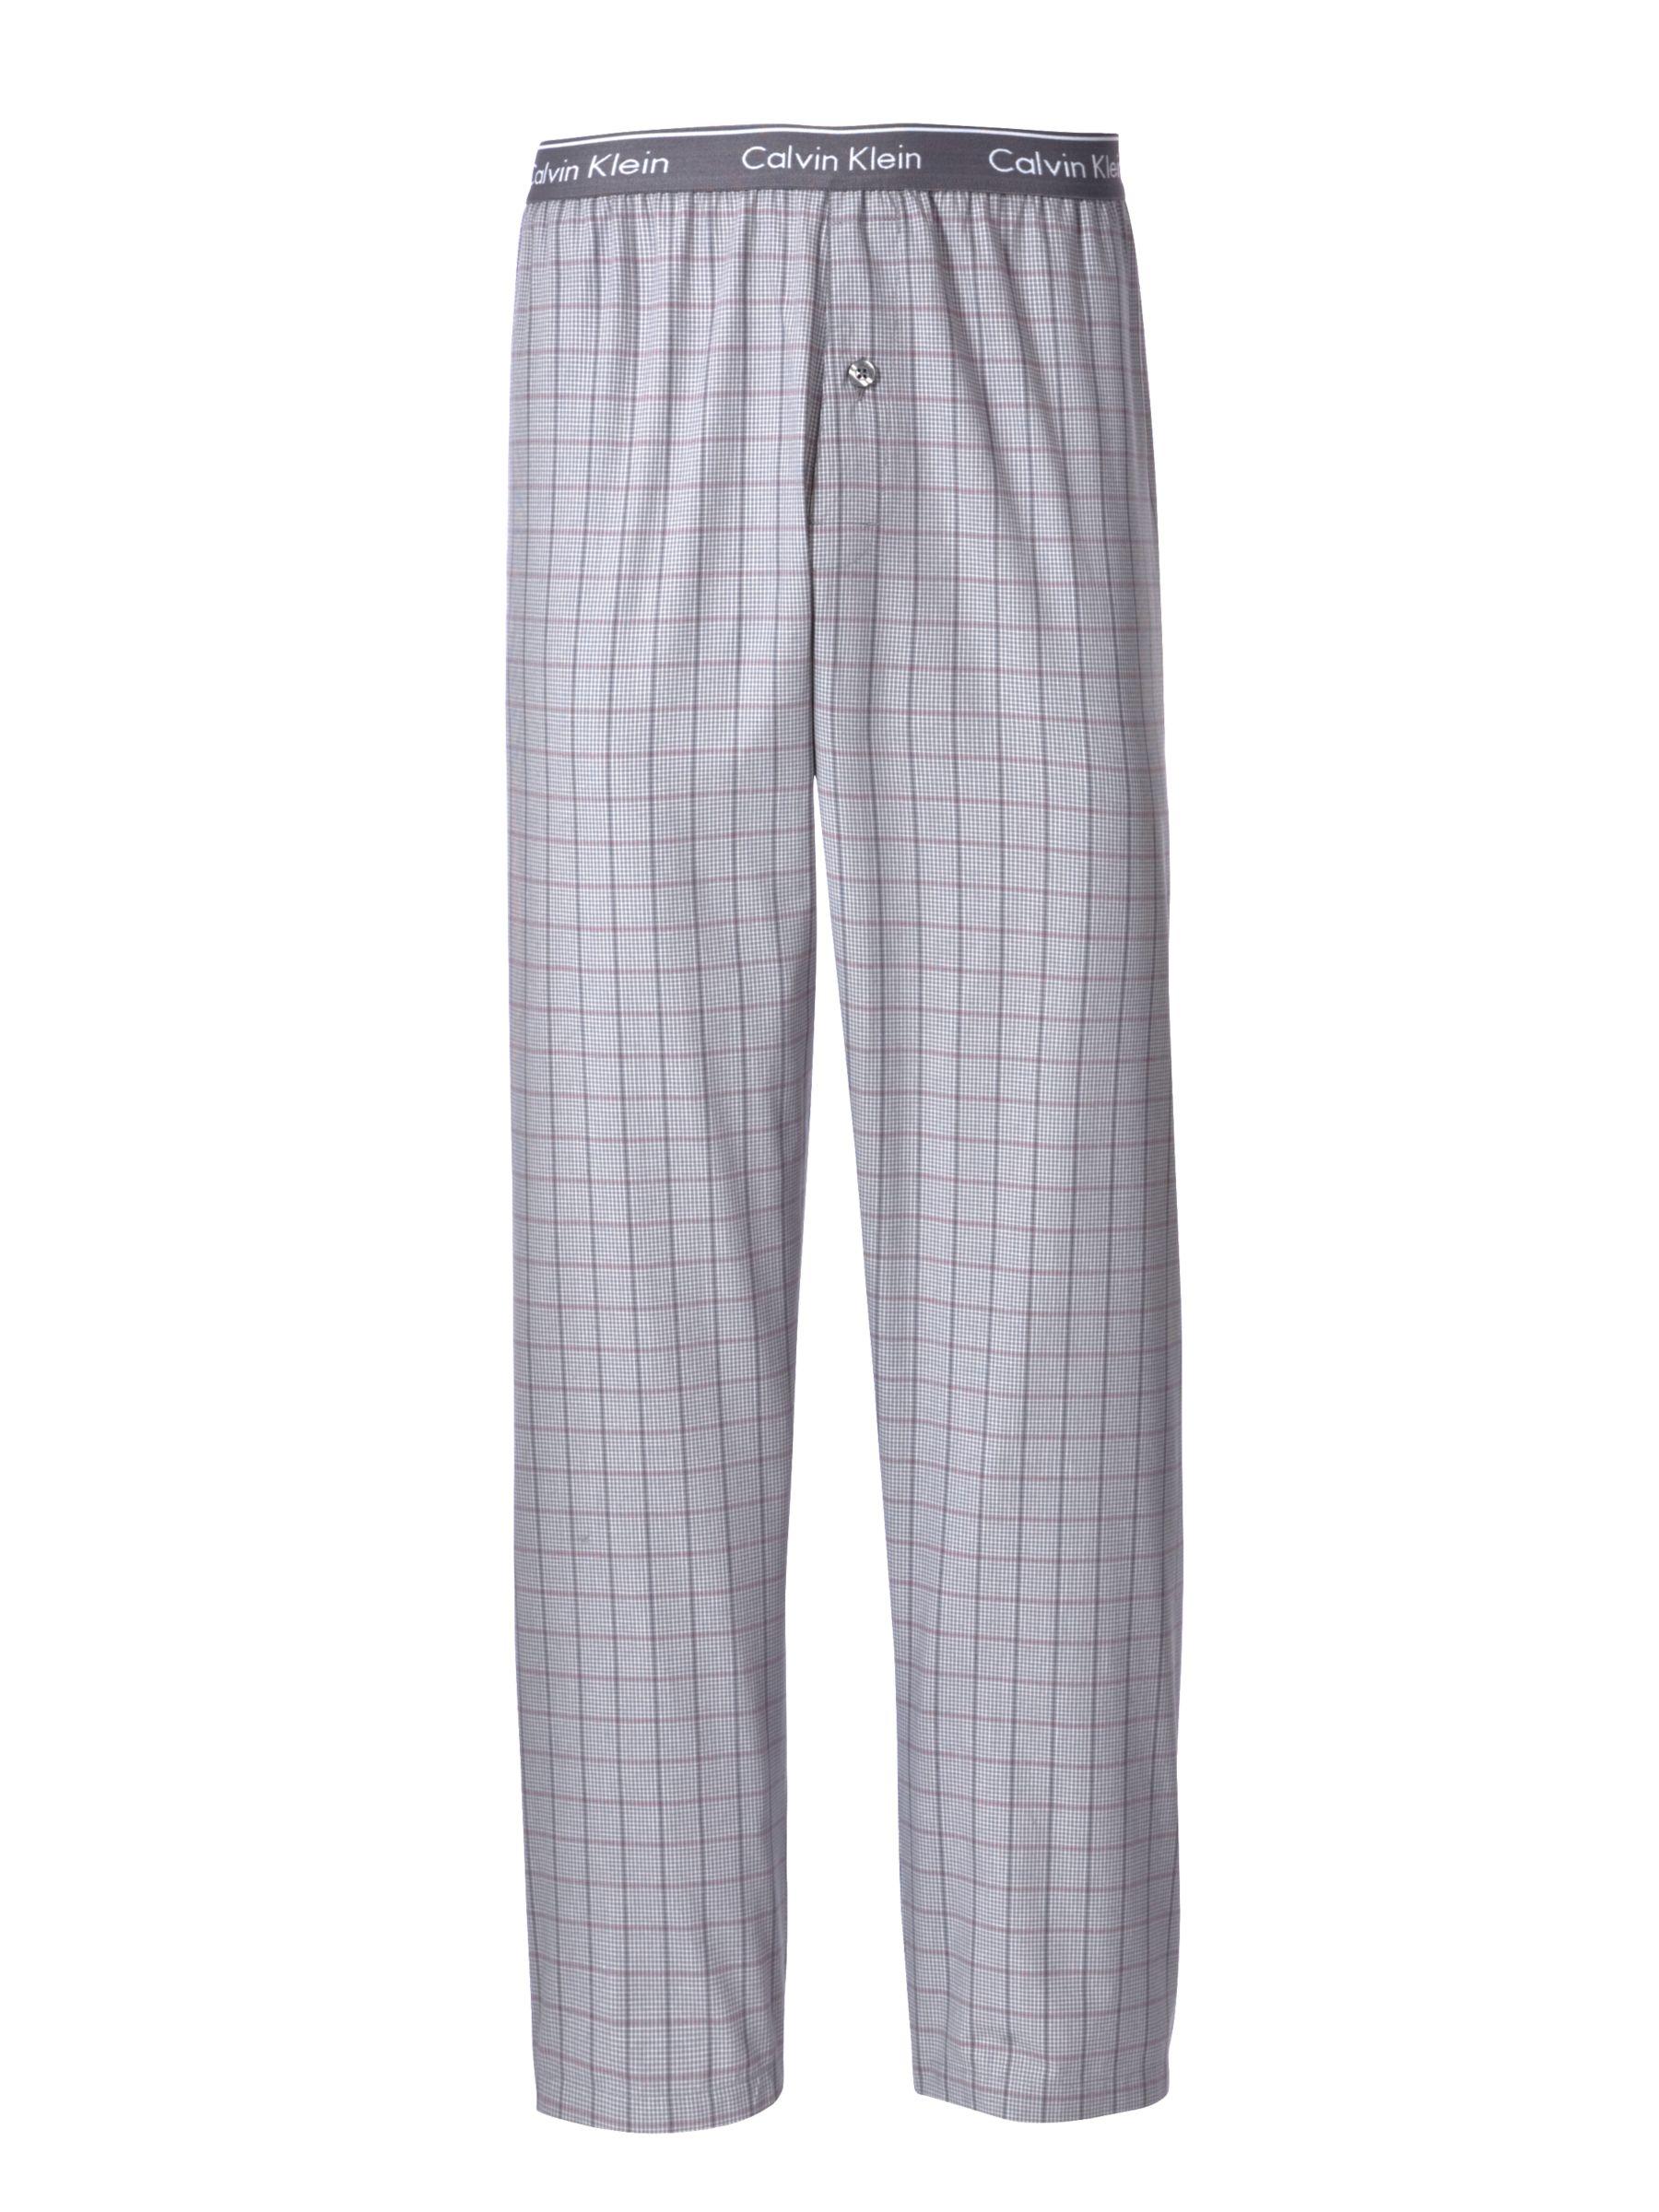 Calvin Klein Woven Plaid Pyjama Pants, Grey